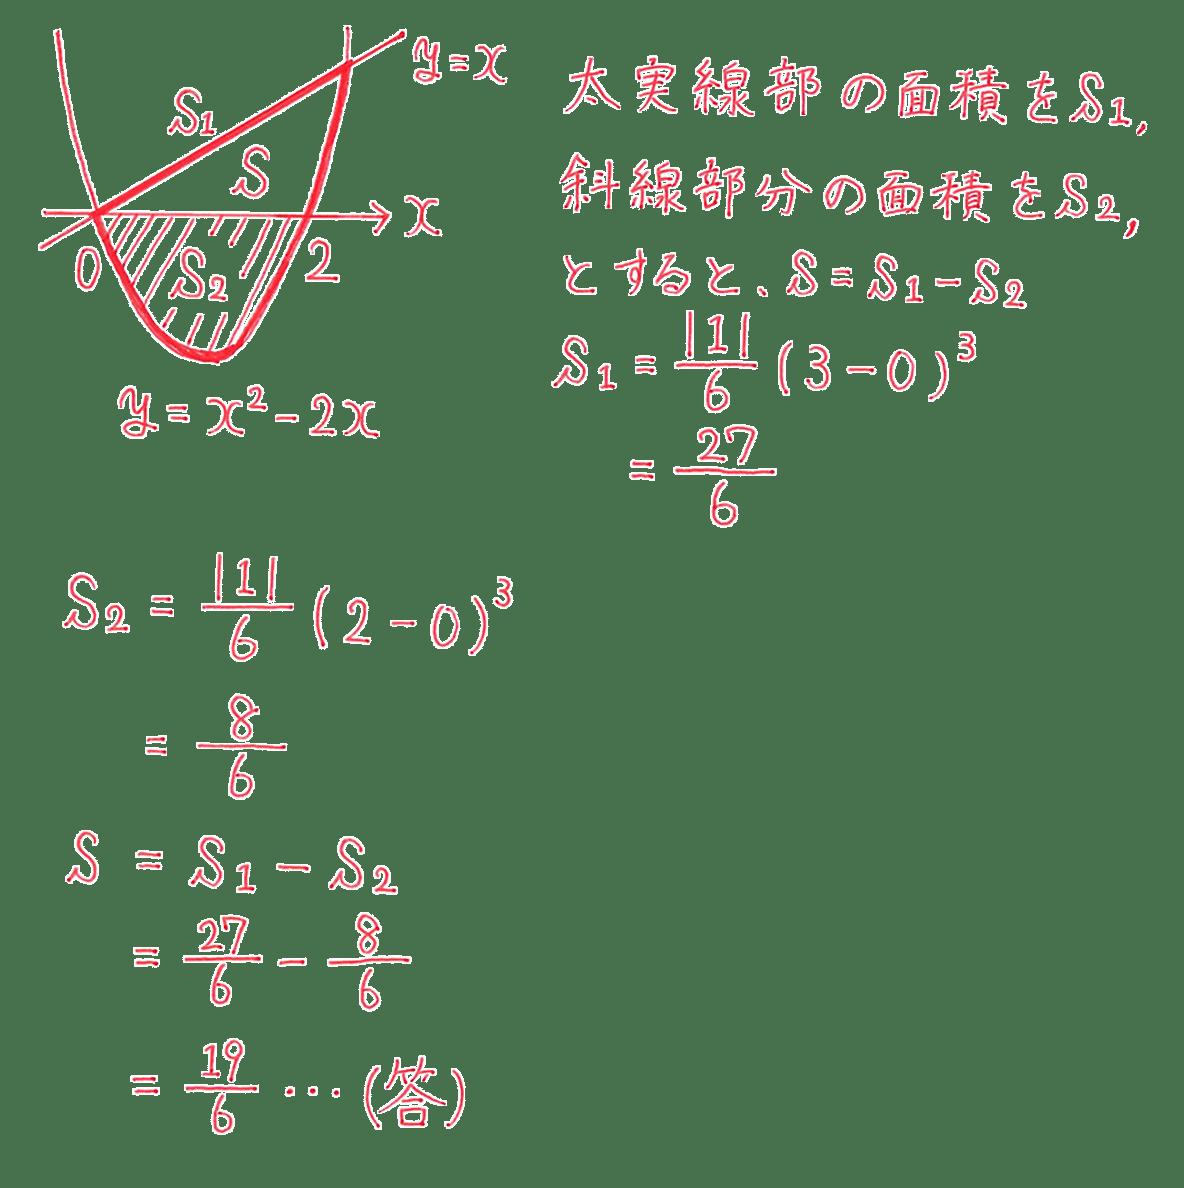 高校数学Ⅱ 微分法と積分法29 練習 答え